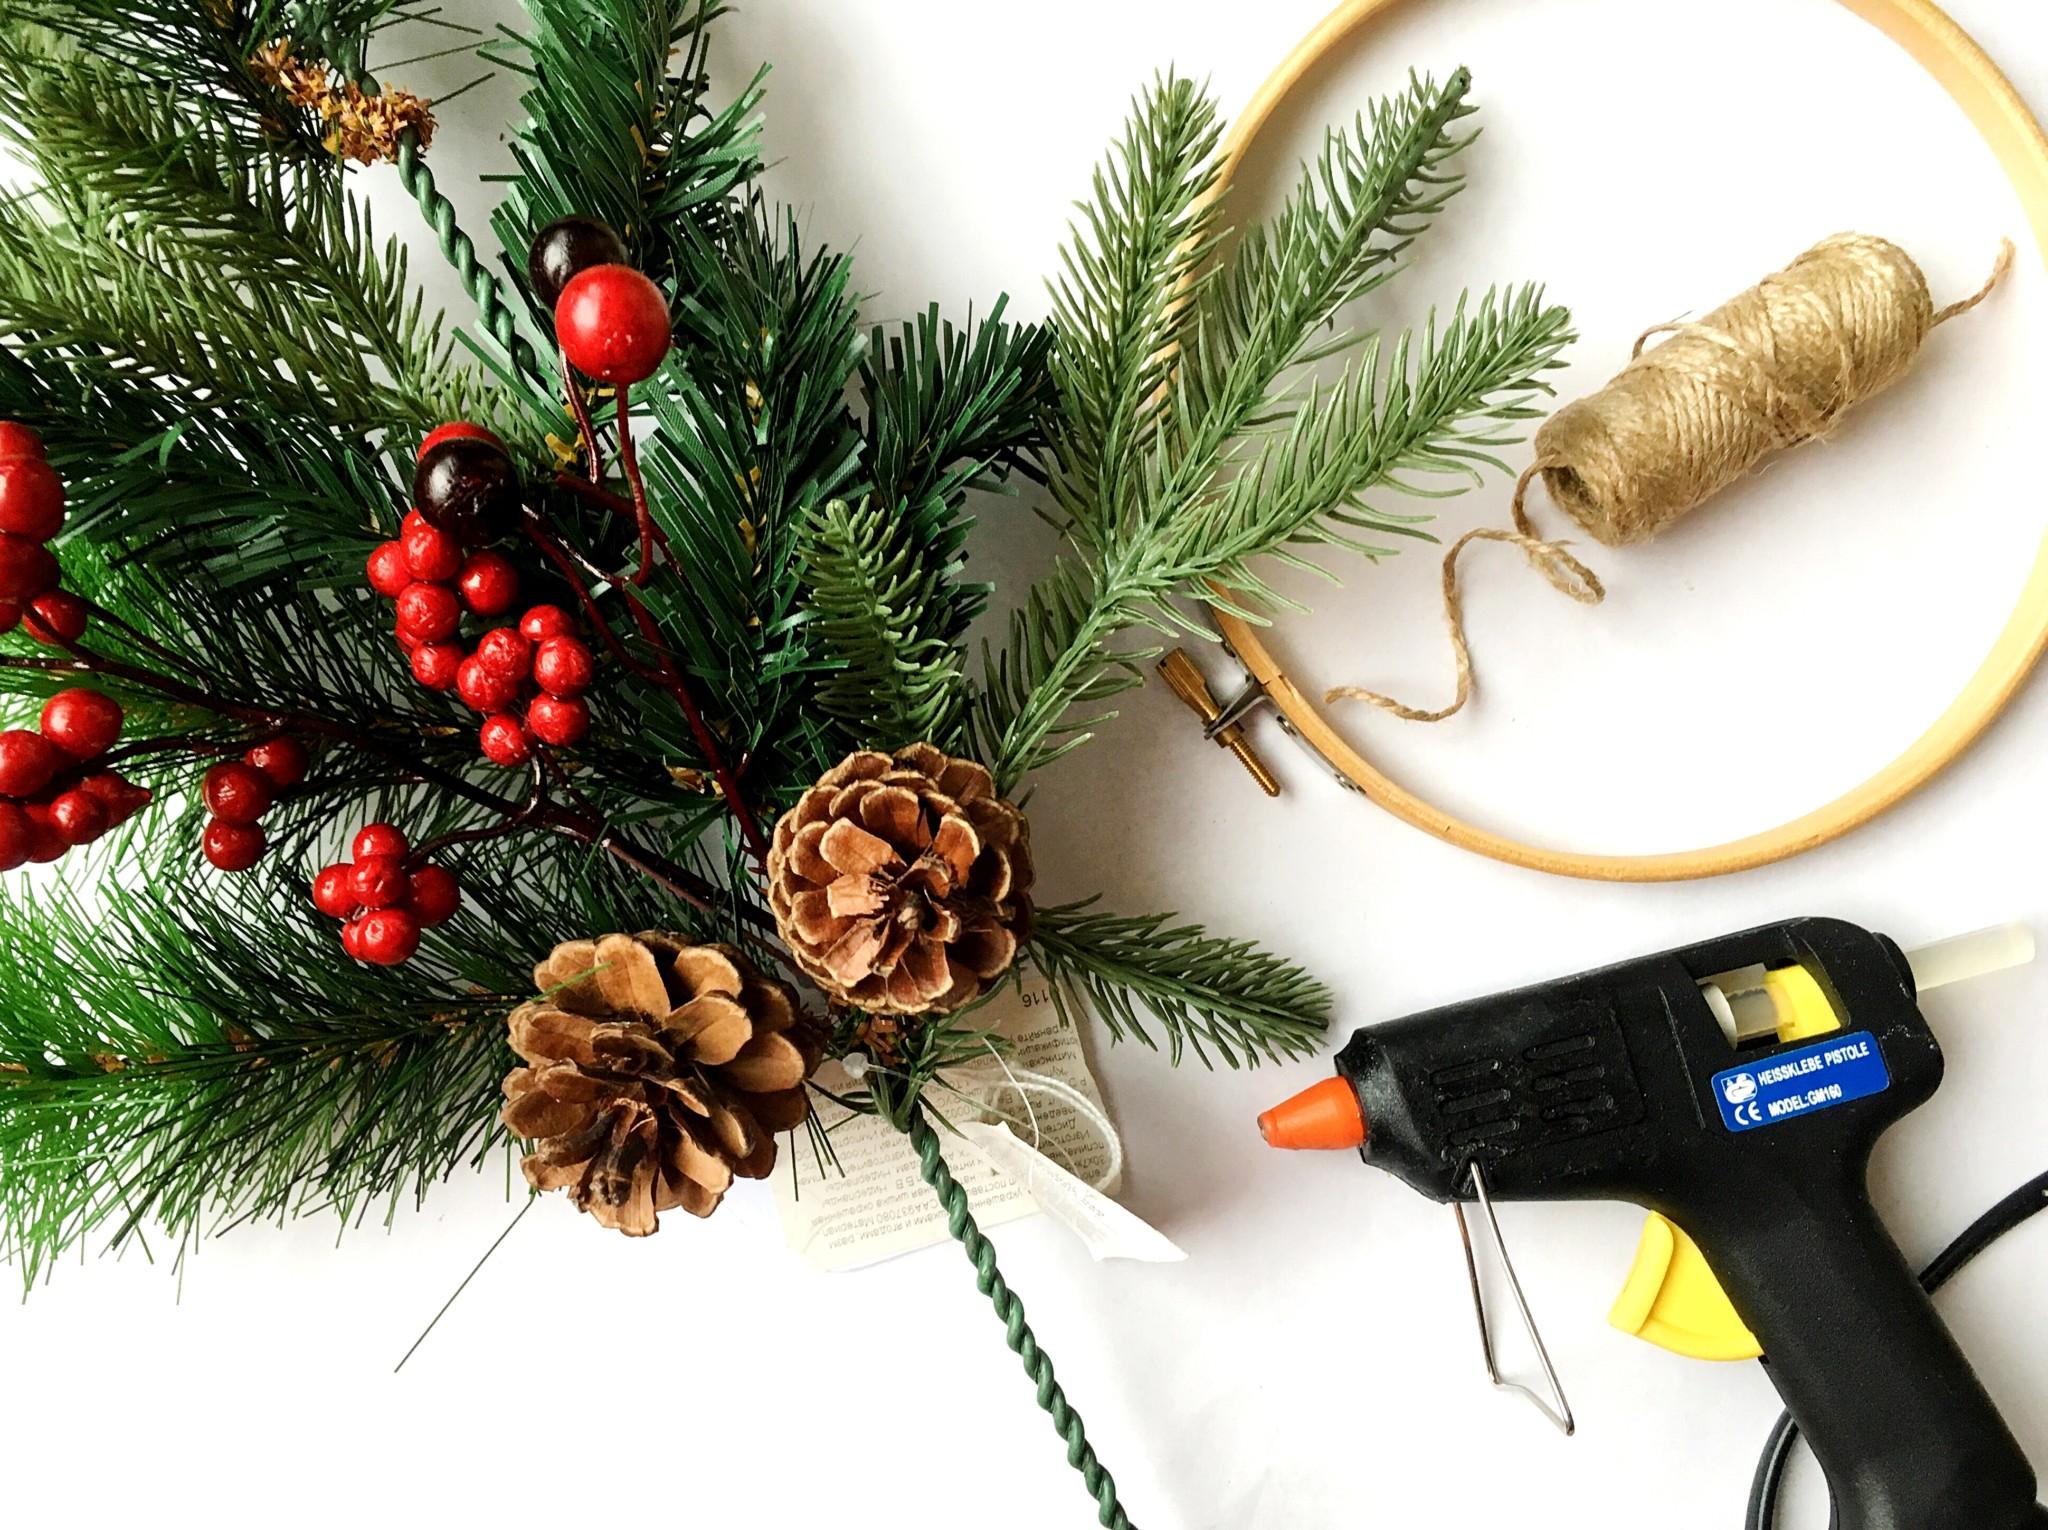 hometocome-kak-sdelat-rozhdestvenskii-venok-svoimi-rukami-01 Простой рождественский венок своими руками